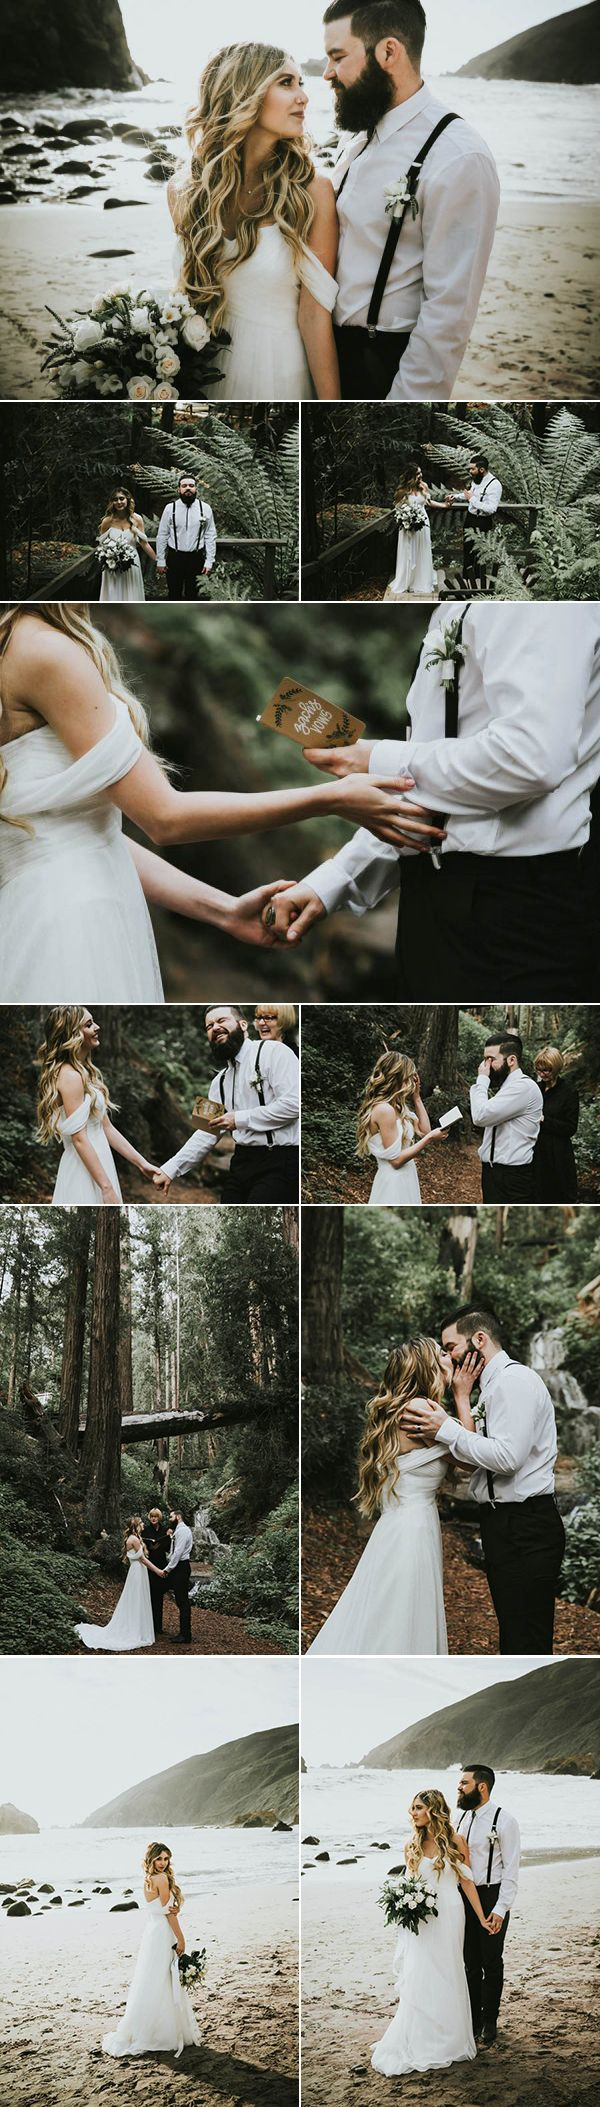 Our Top 21 Favorite Elopements on Junebug Weddings | Junebug Weddings |  Elope wedding, Wedding photos, Junebug weddings